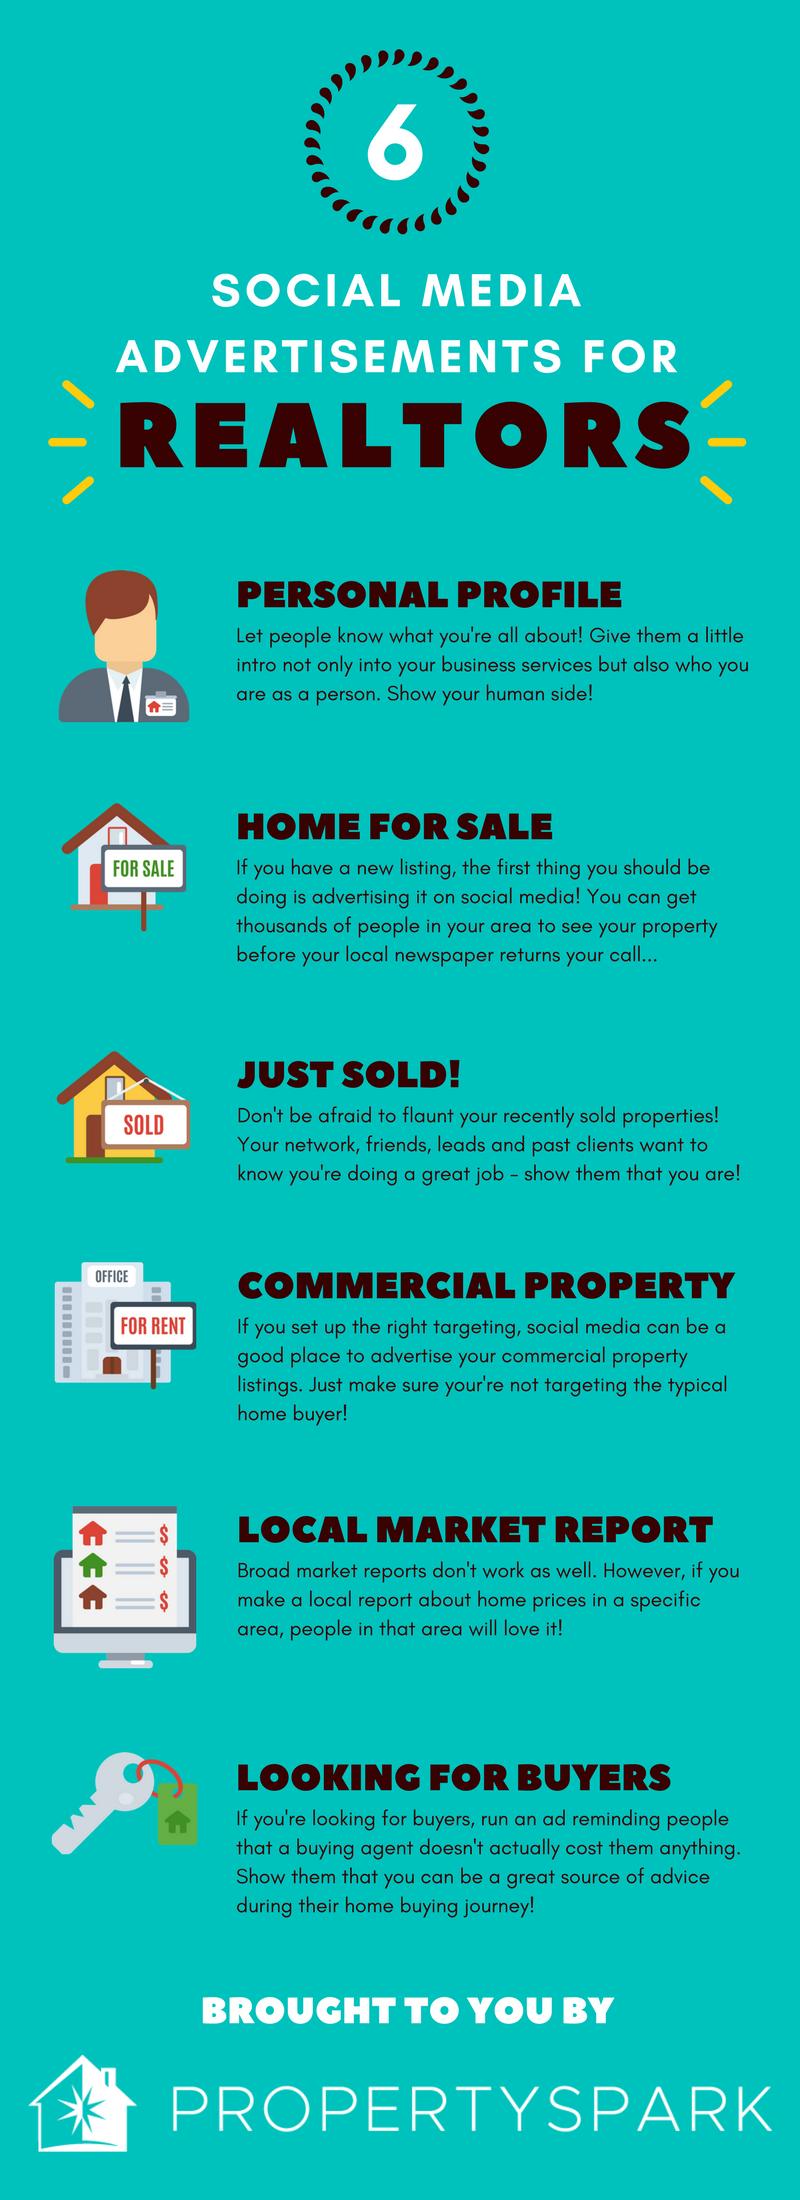 6 Social Media Advertisements for Realtors - PropertySpark